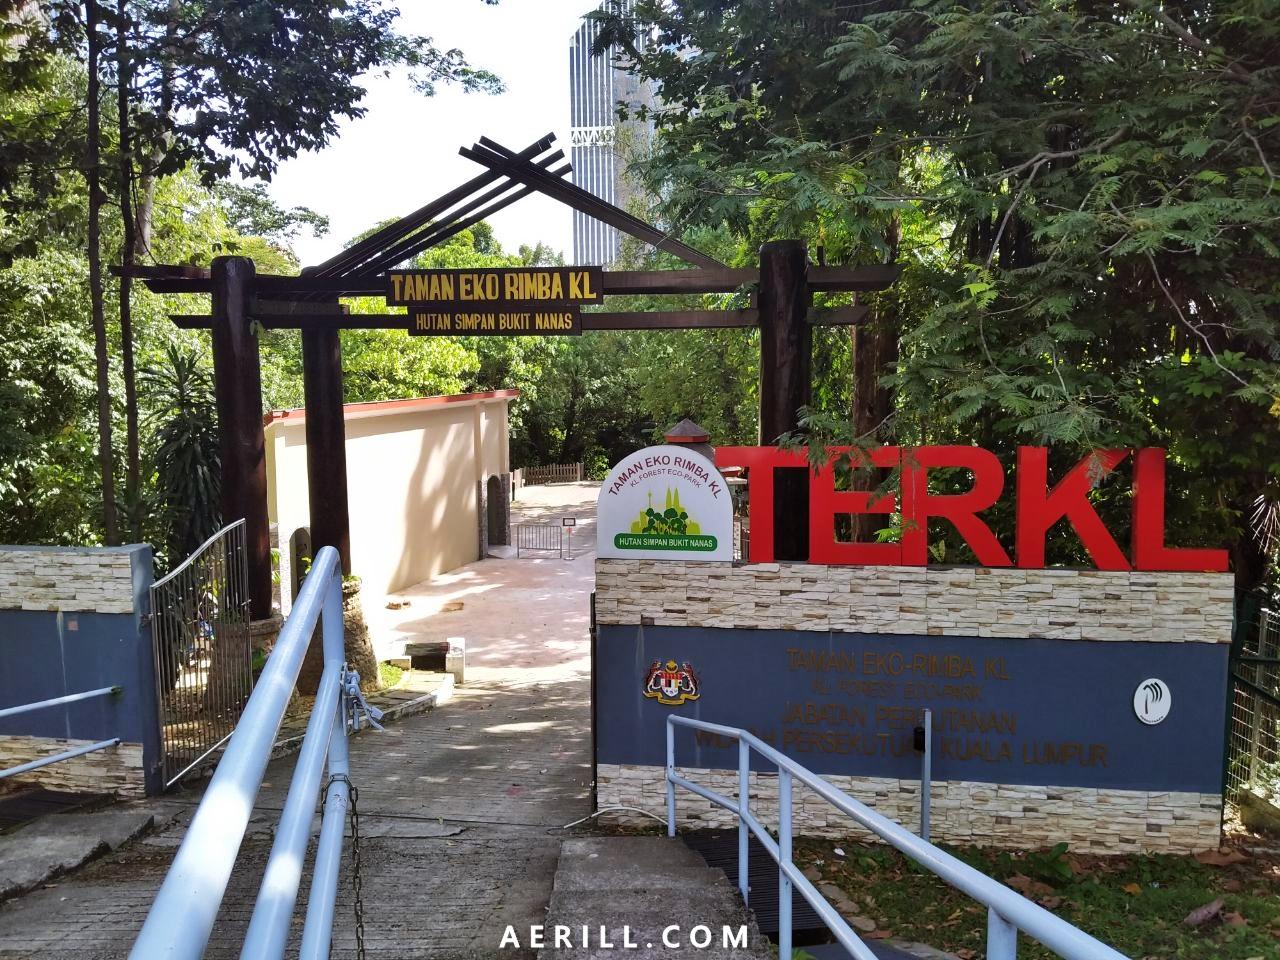 Jalan-Jalan di Taman Eko Rimba Kuala Lumpur : Paru-Paru Hijau Kuala Lumpur